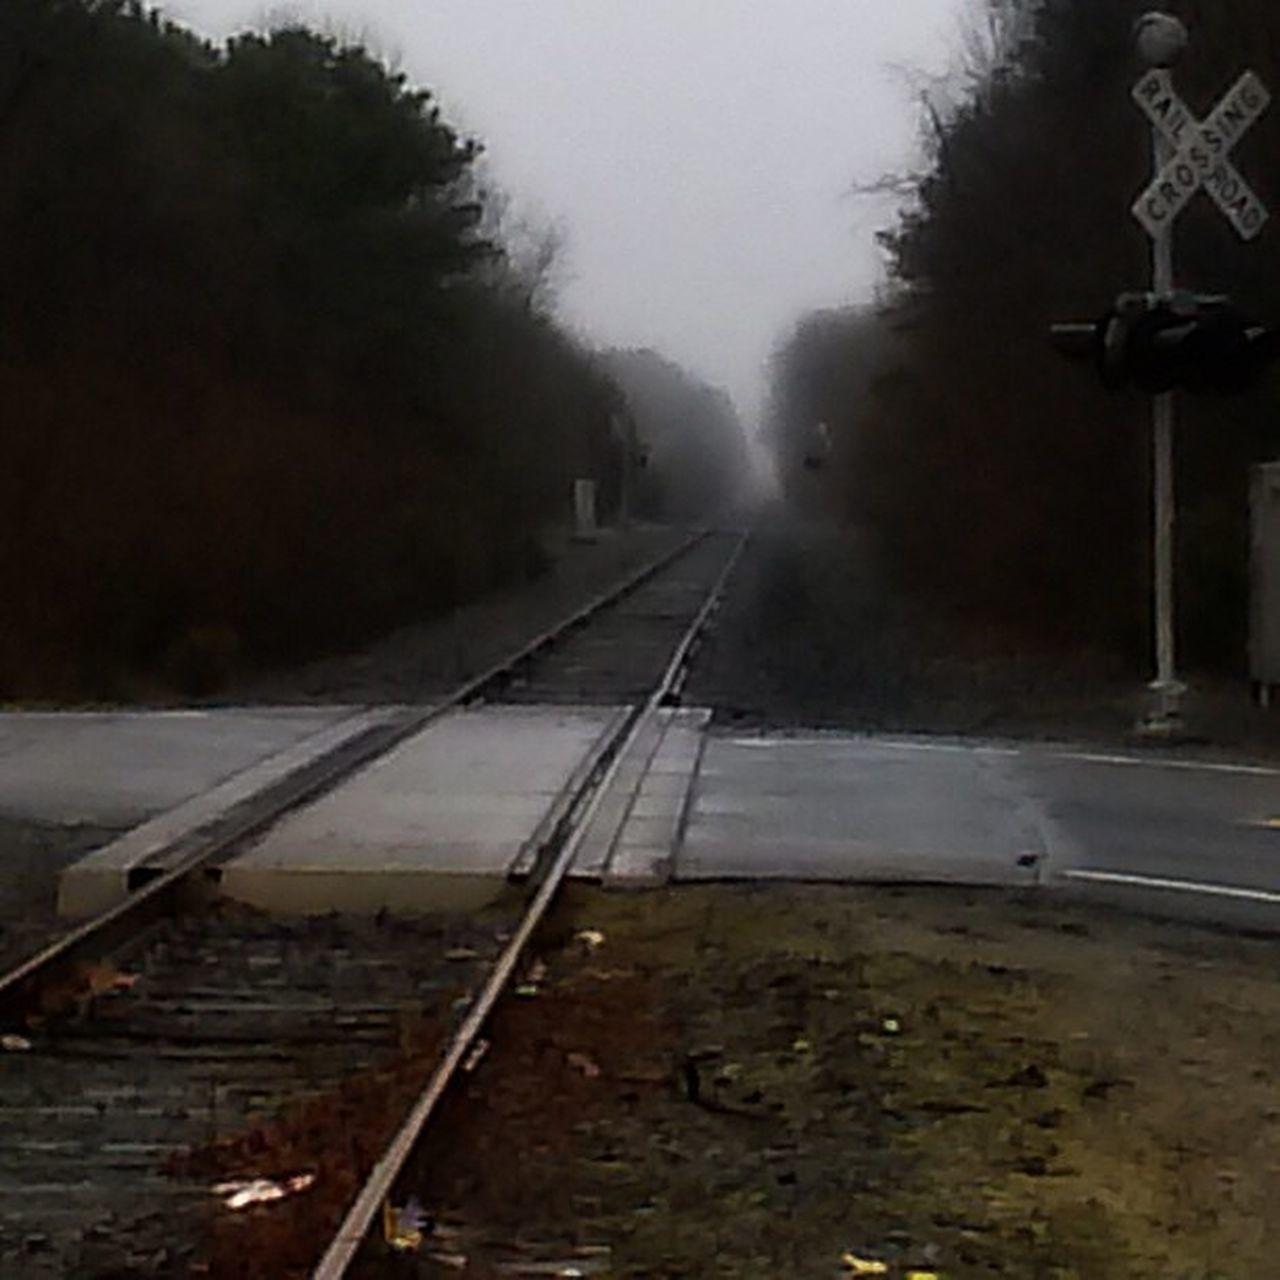 transportation, railroad track, weather, rail transportation, no people, outdoors, fog, day, tree, nature, sky